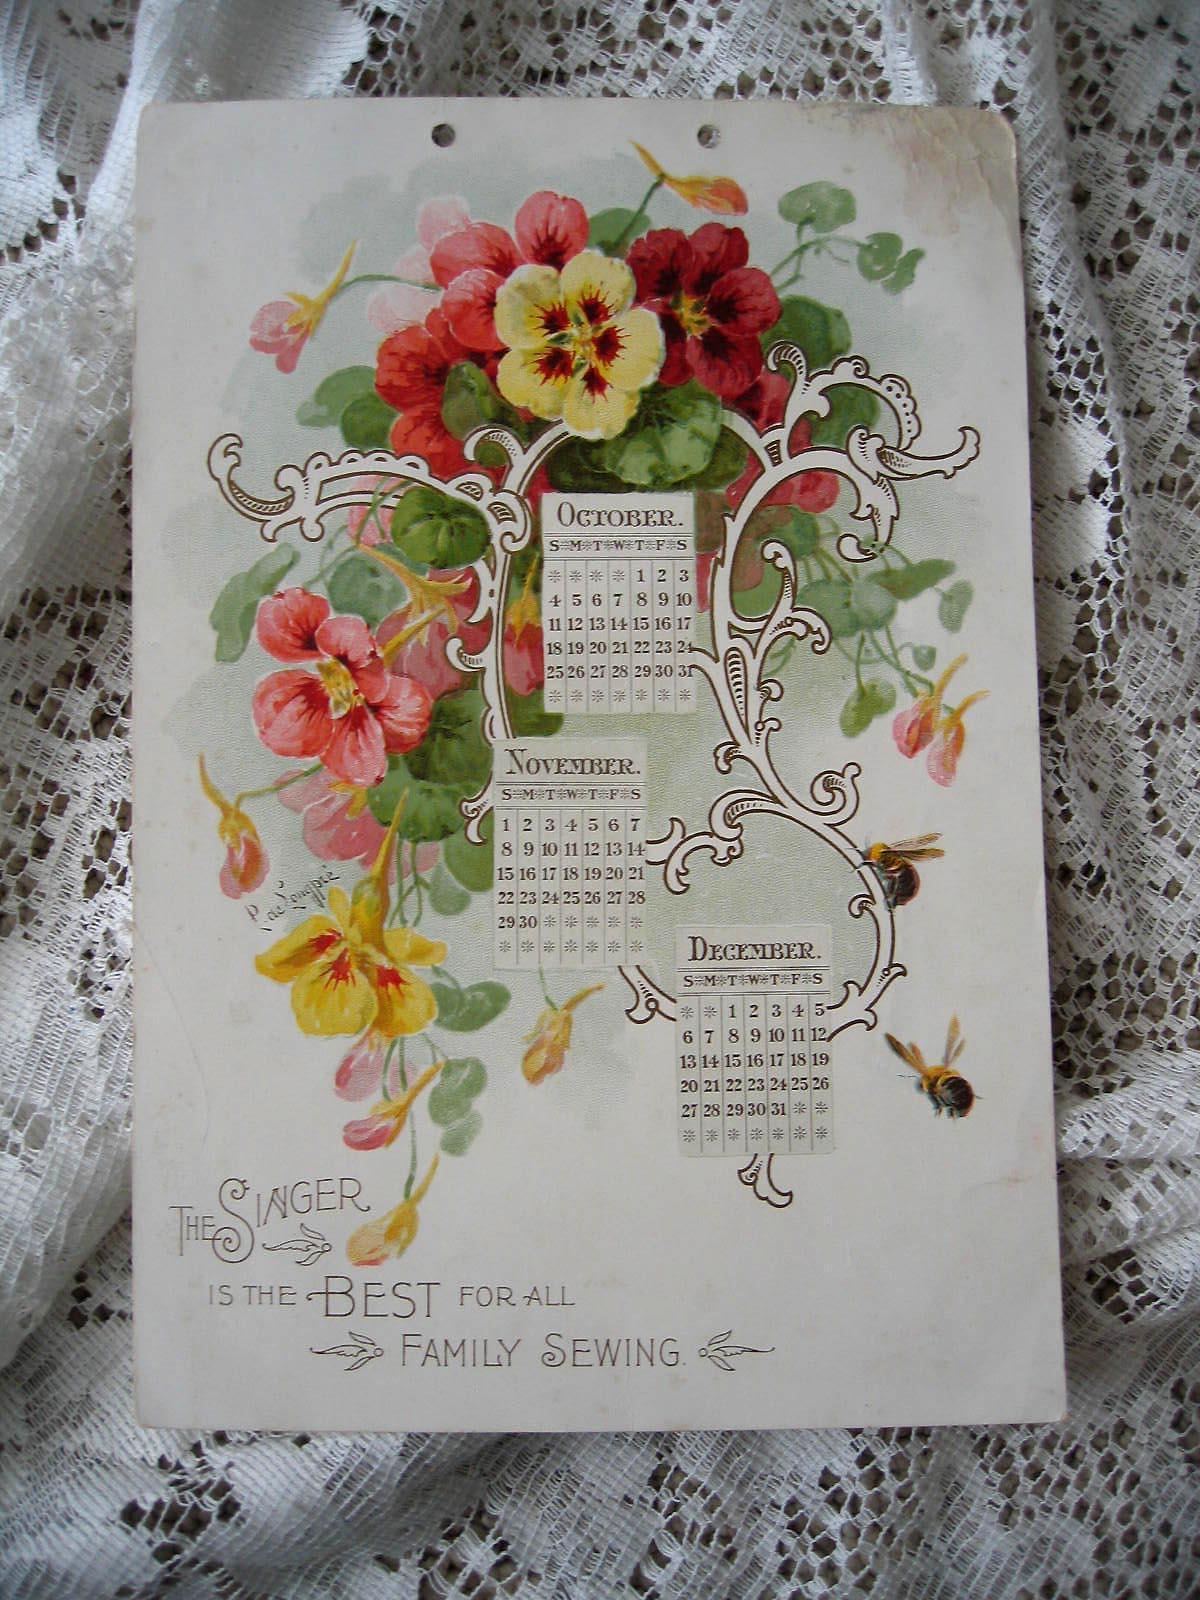 c1894 Paul de Longpre Singer Sewing Calendar Print Nasturtiums Bees Gold Chromolithograph Signed